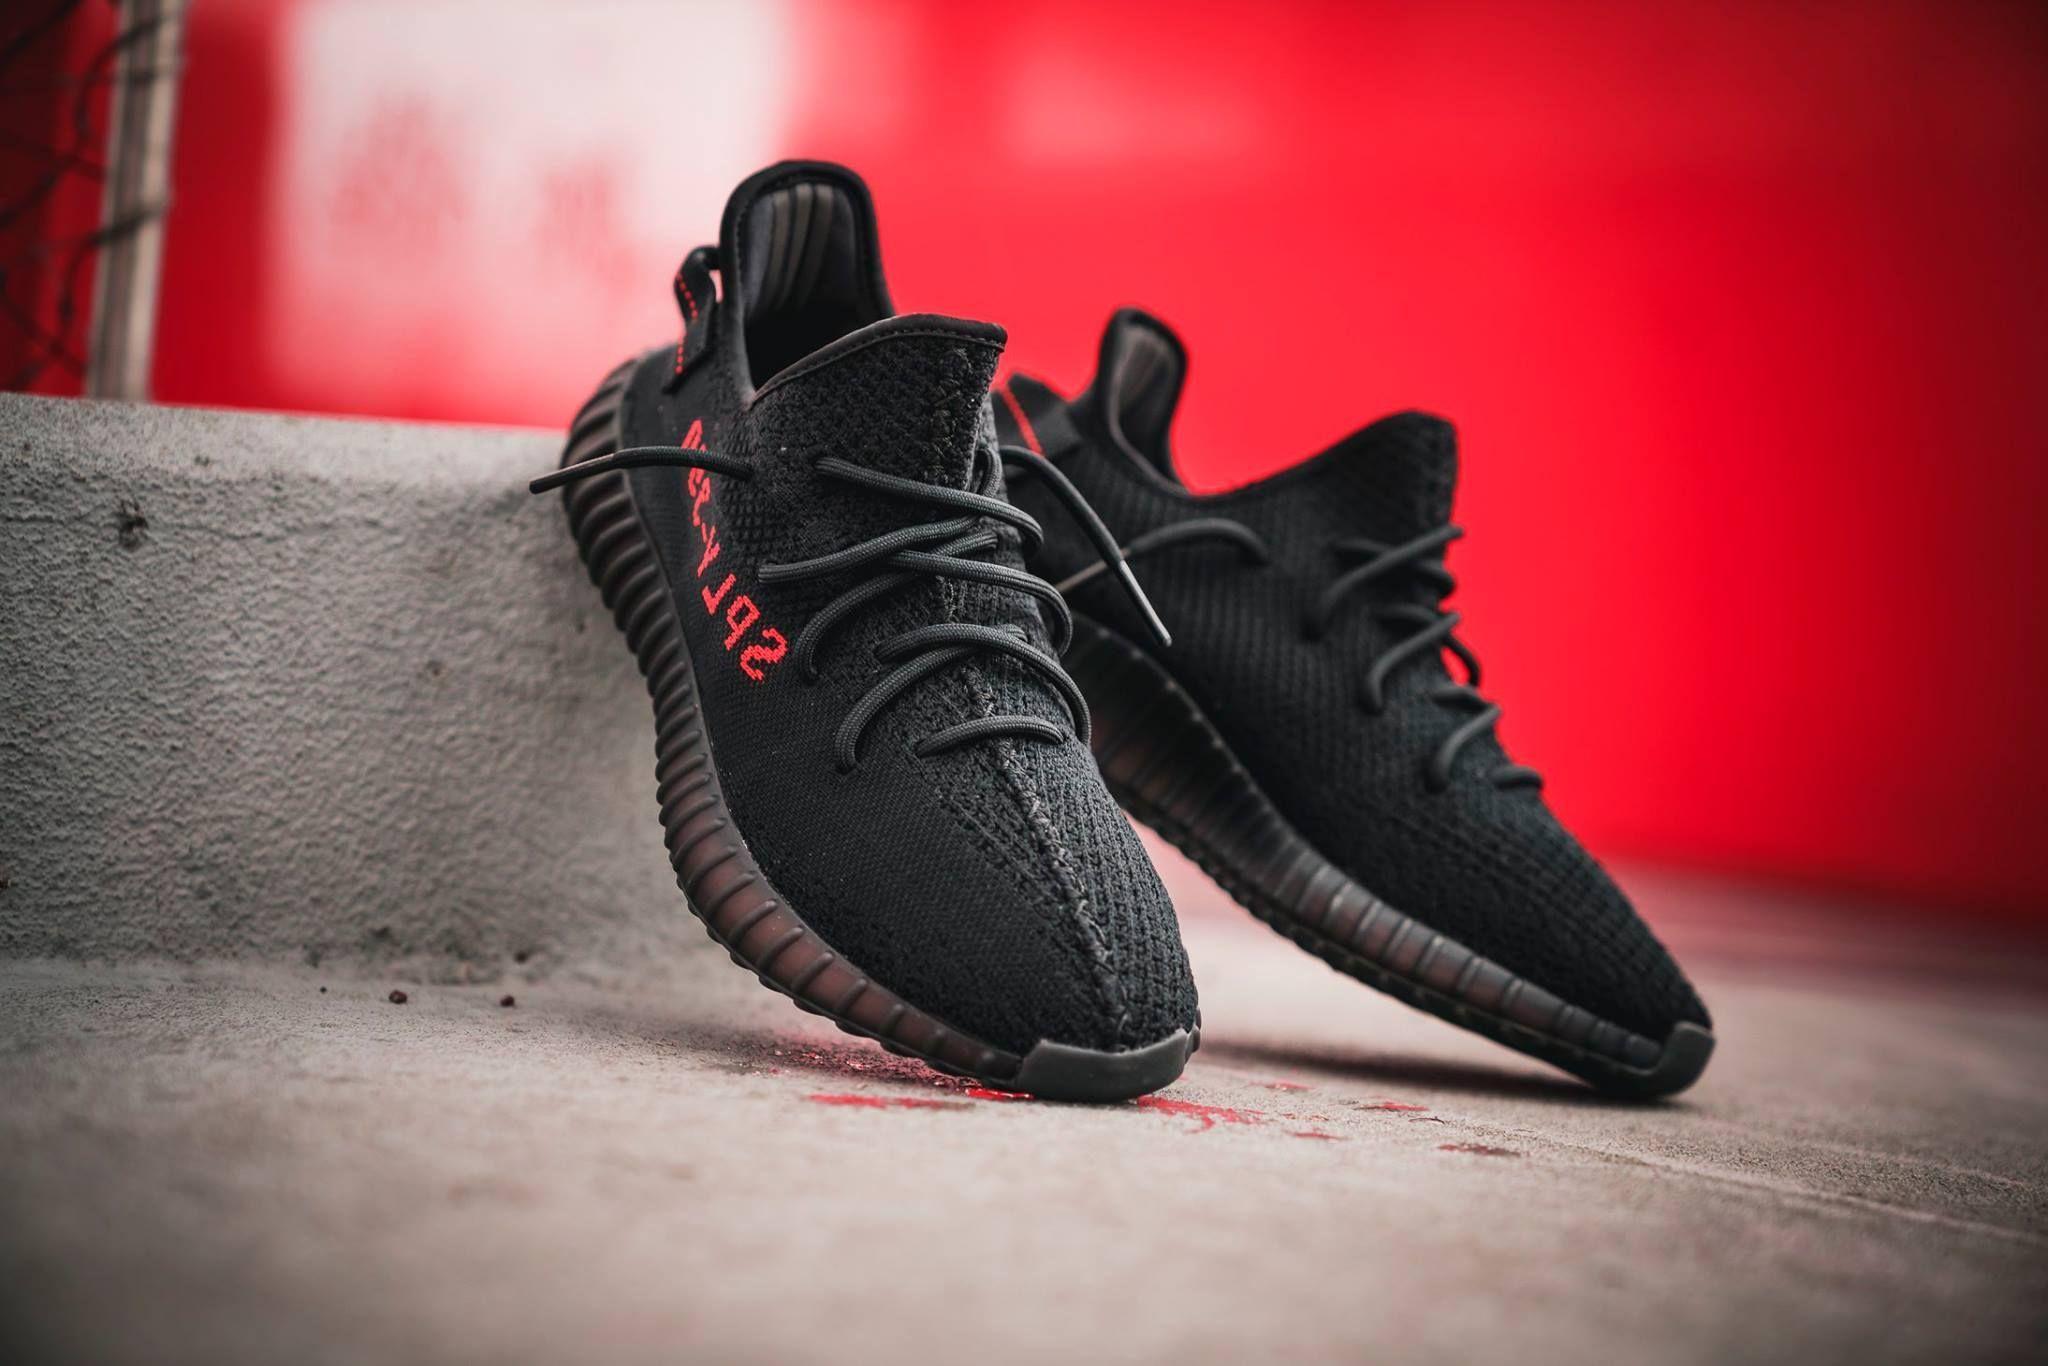 b0ecea7150cf9 adidas Yeezy Boost 350 V2 – Core Black   Red   Closer Look